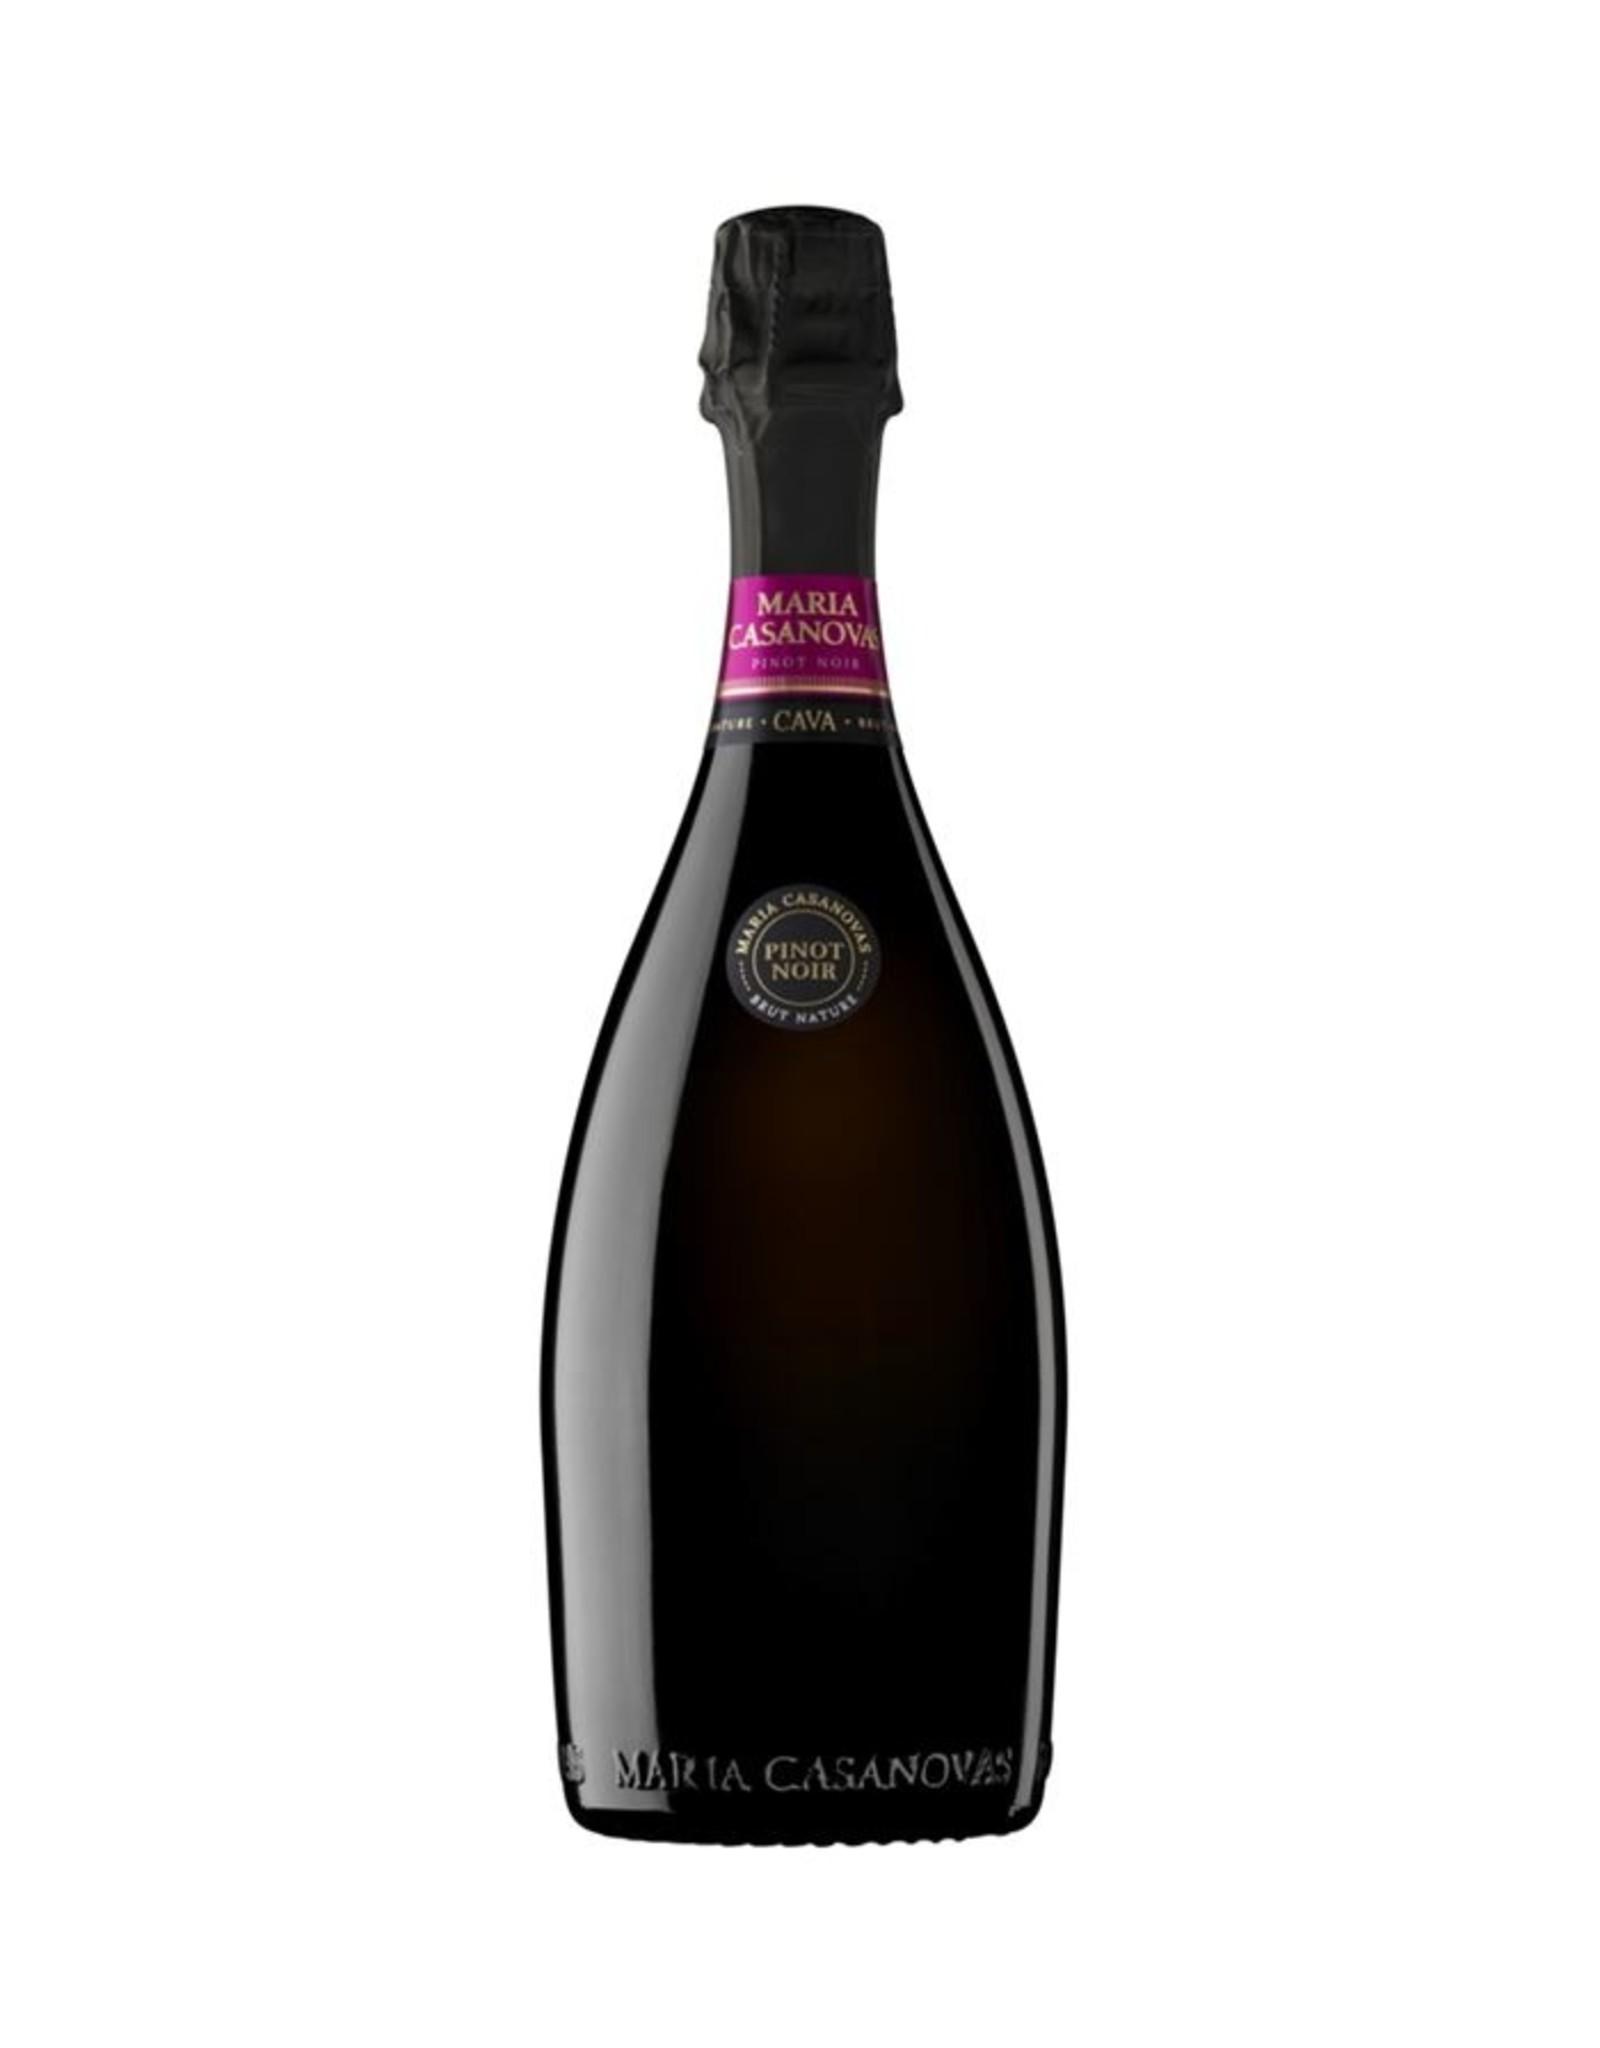 Proef Maria Casanovas Pinot Noir Rosado